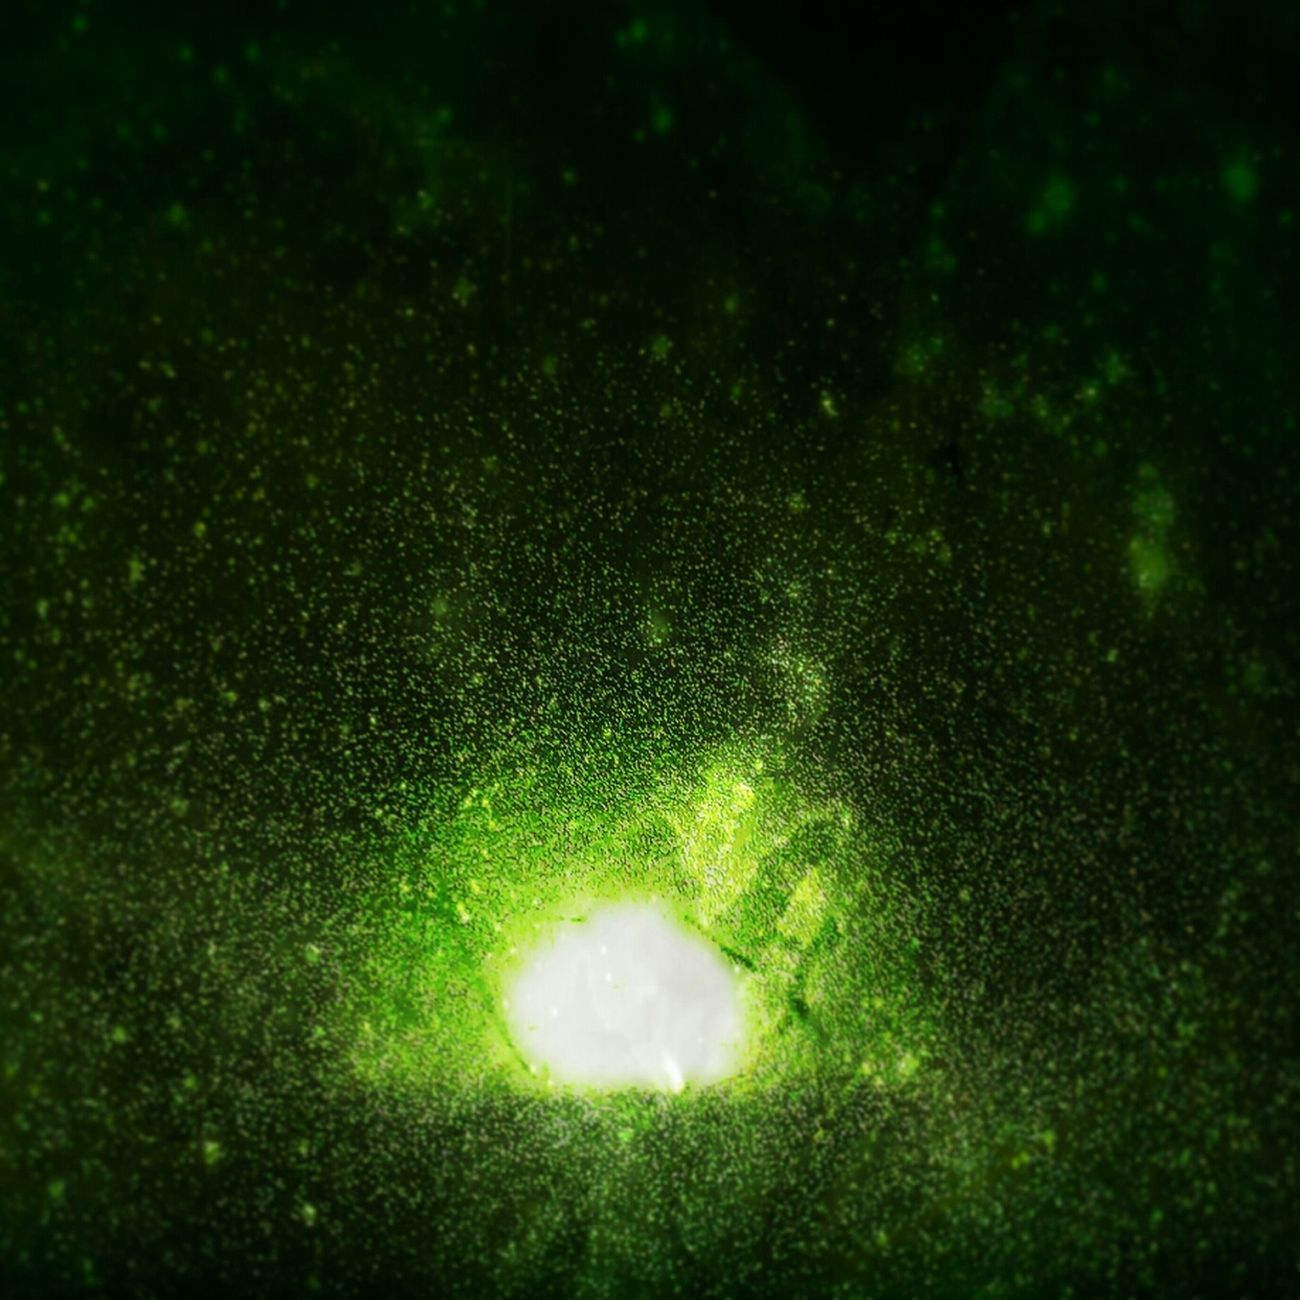 Ireland St. Patricks Day Galaxy Galicia Agujero Verde Green Hole